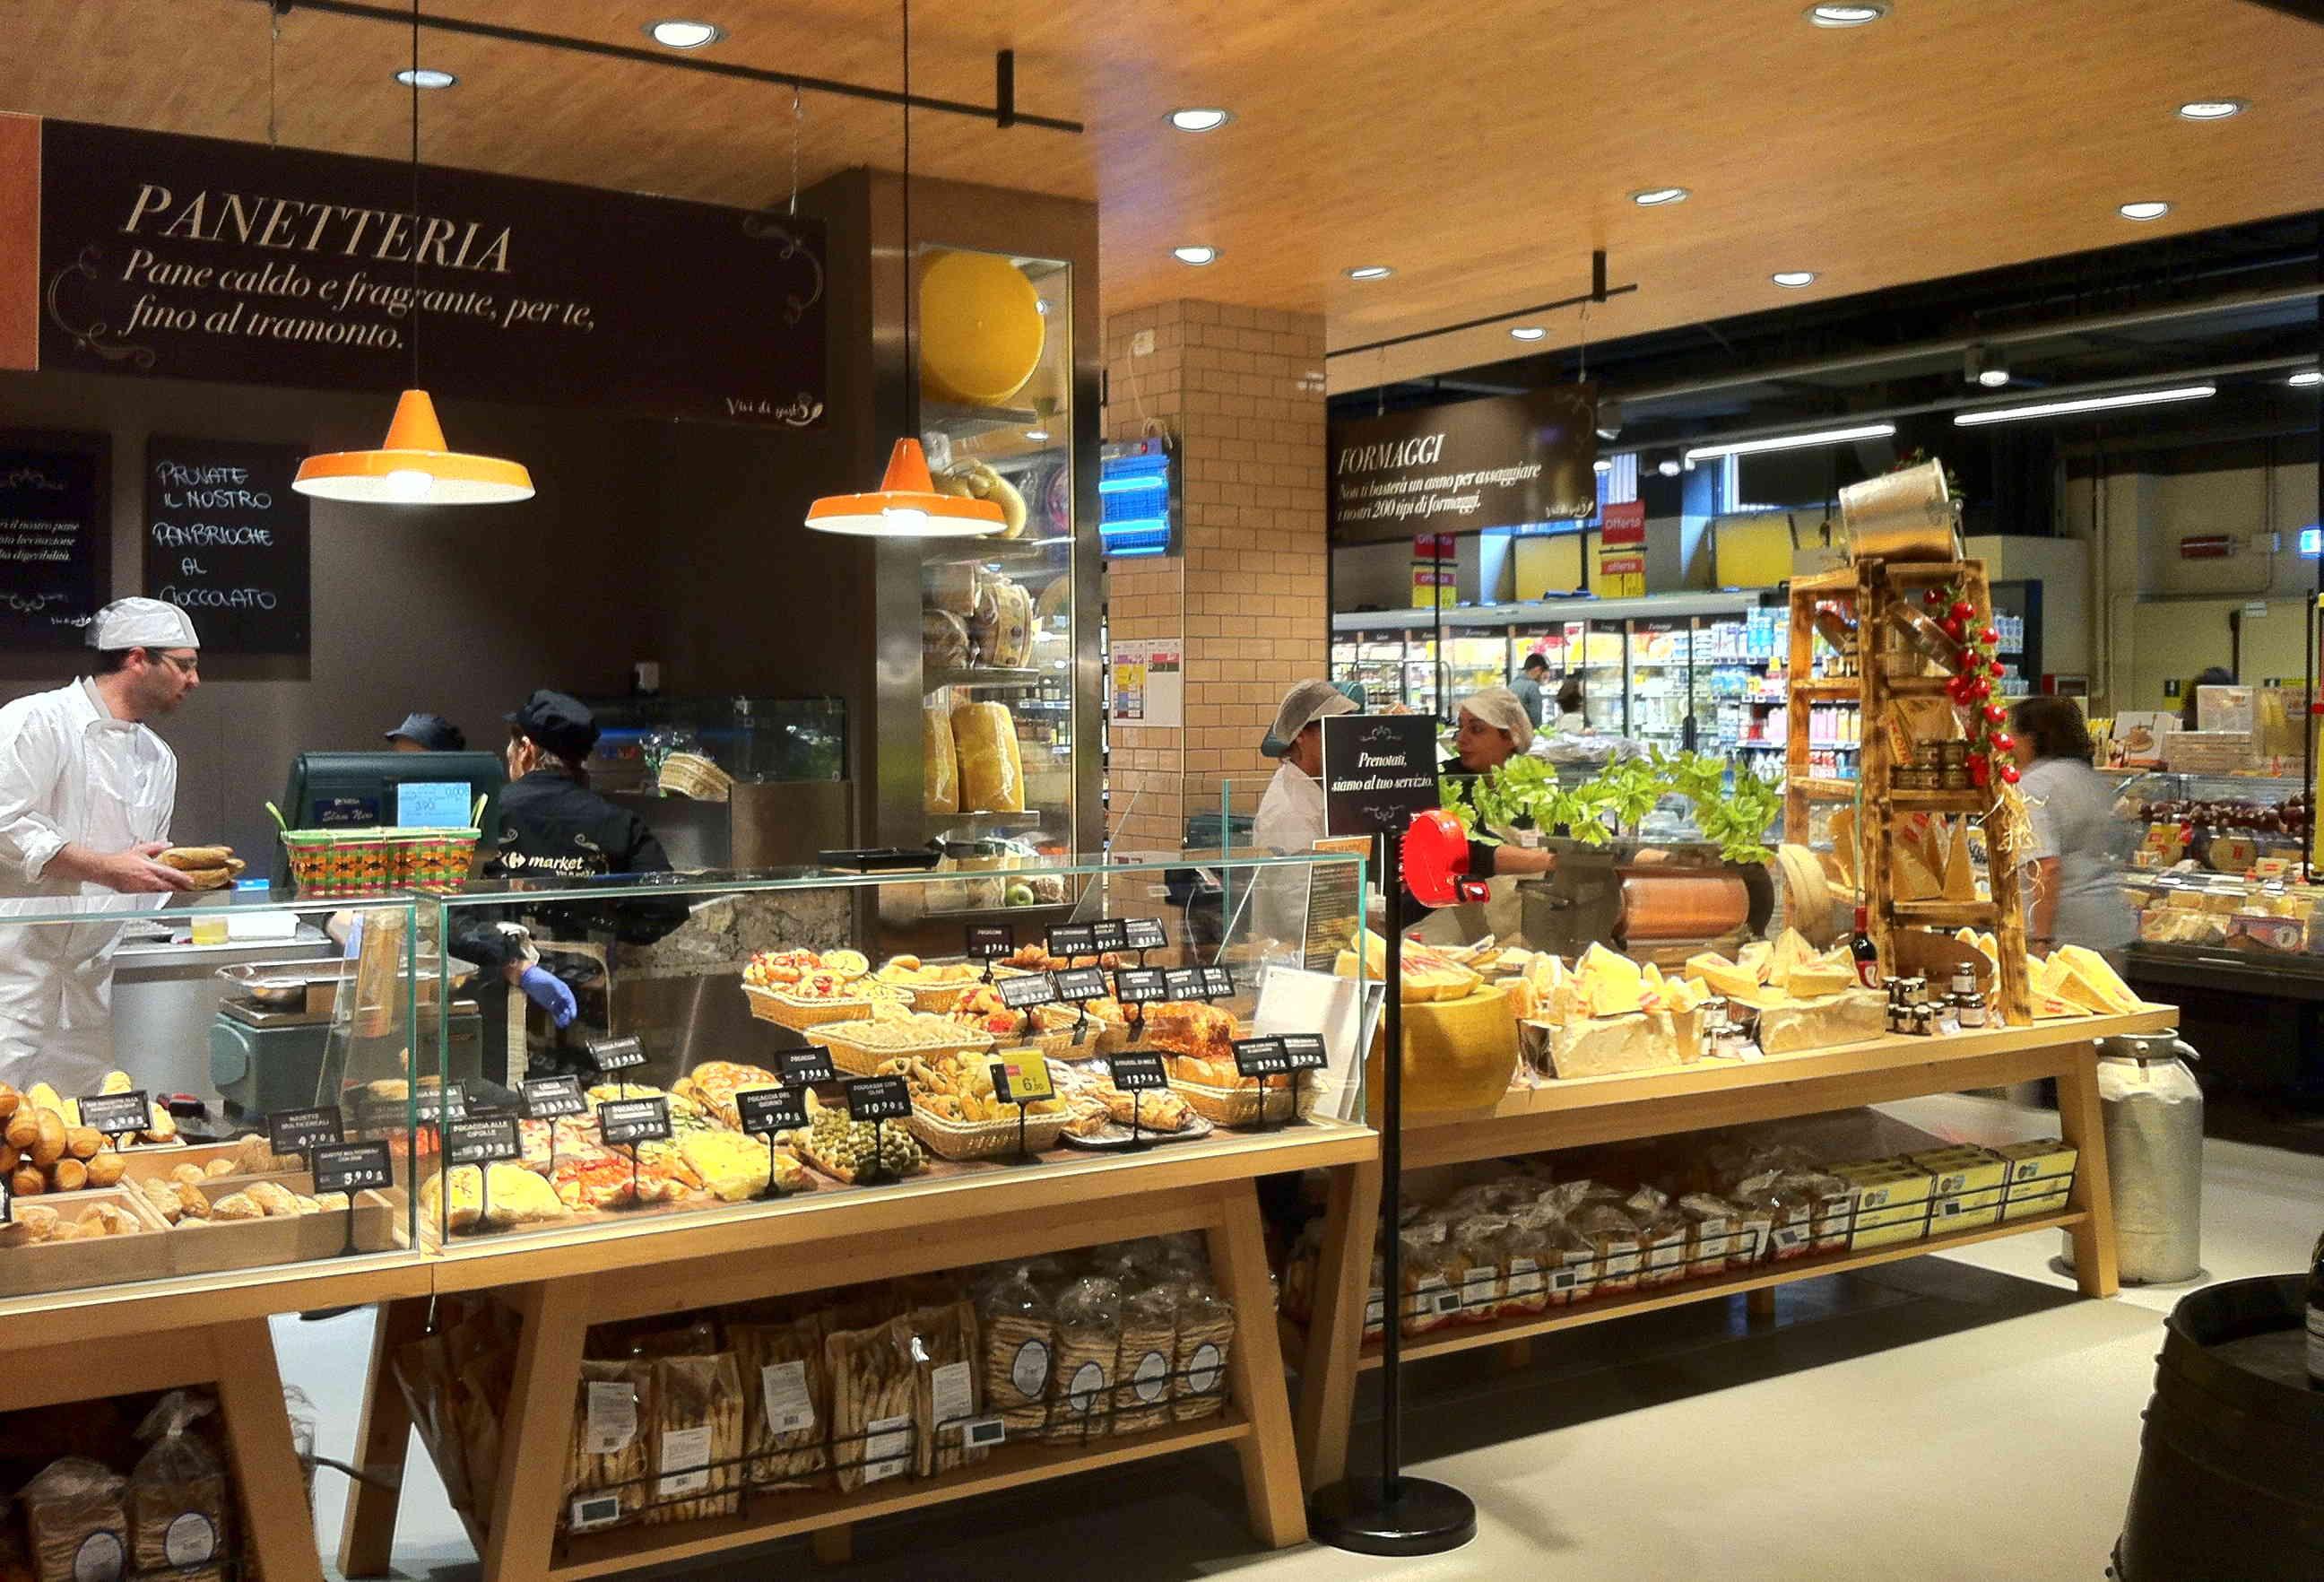 bb supermarket bakeries unclear - HD2592×1764